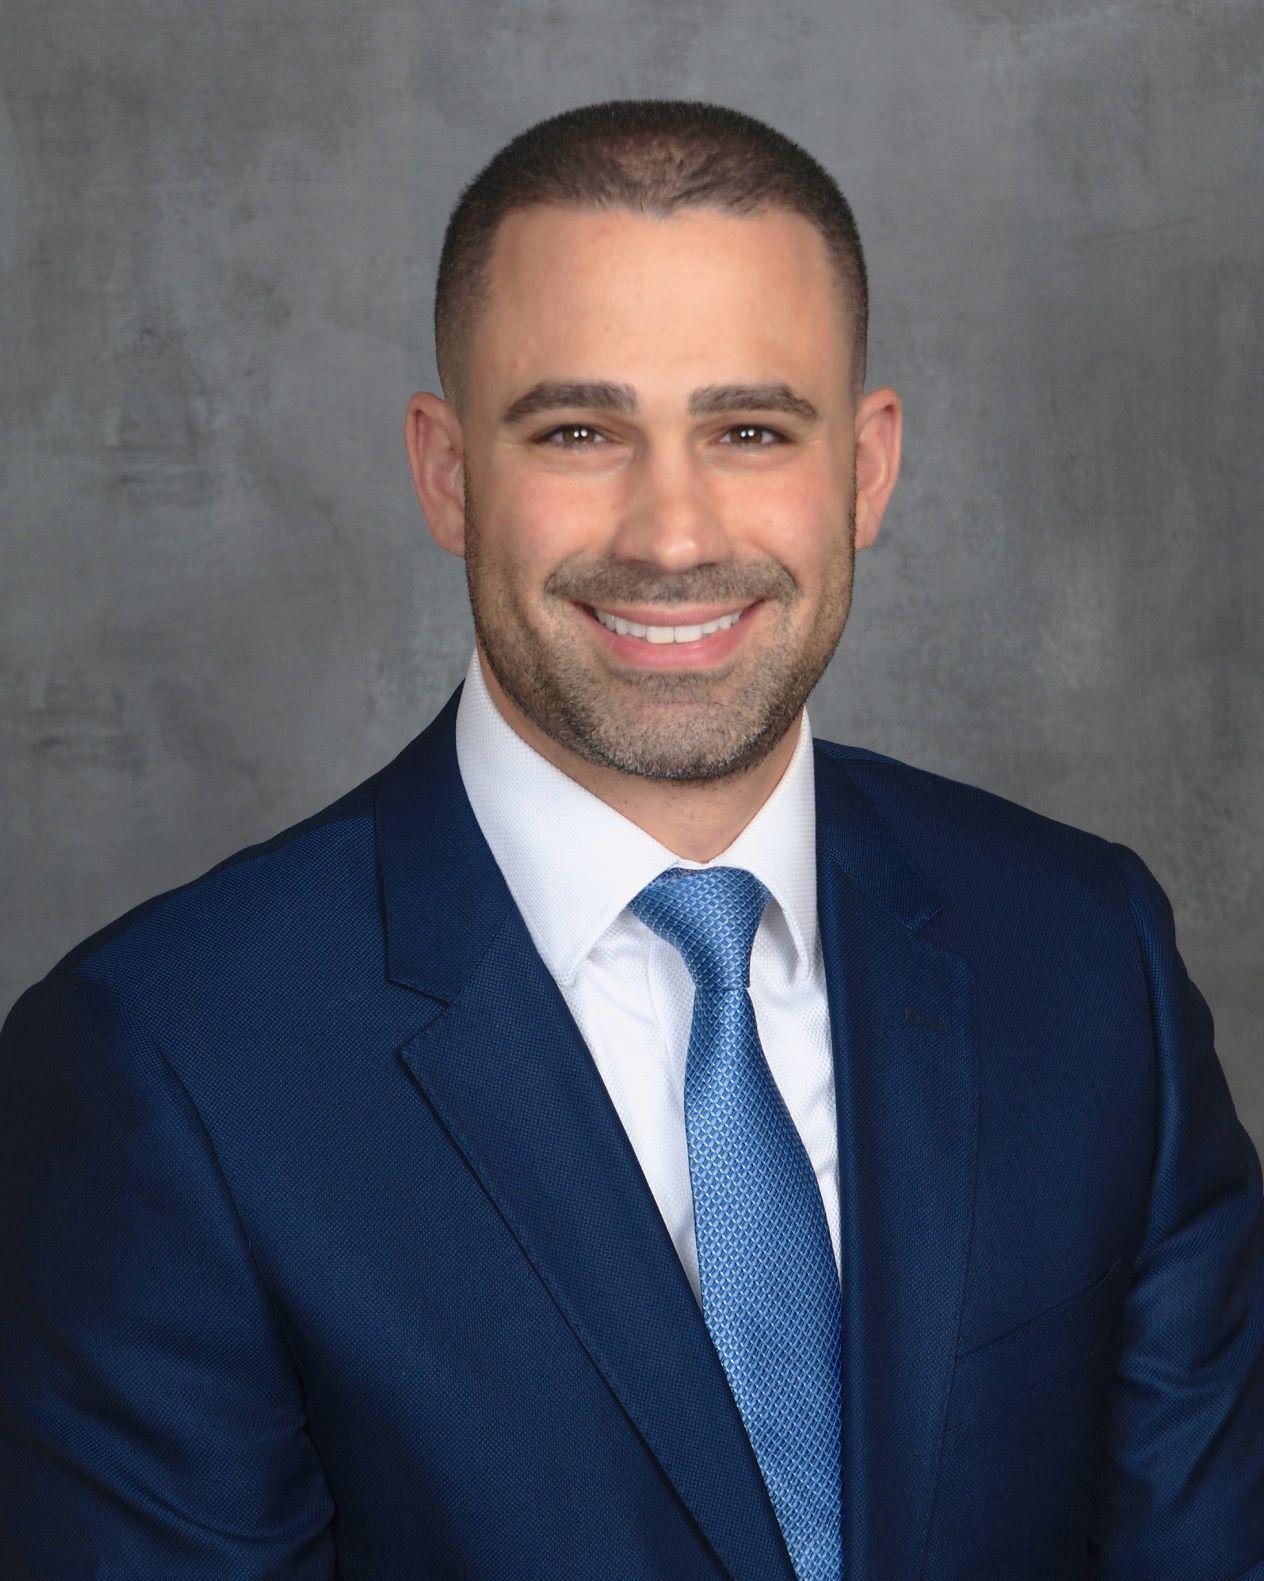 JAMES C. REUTER Financial Professional & Insurance Agent